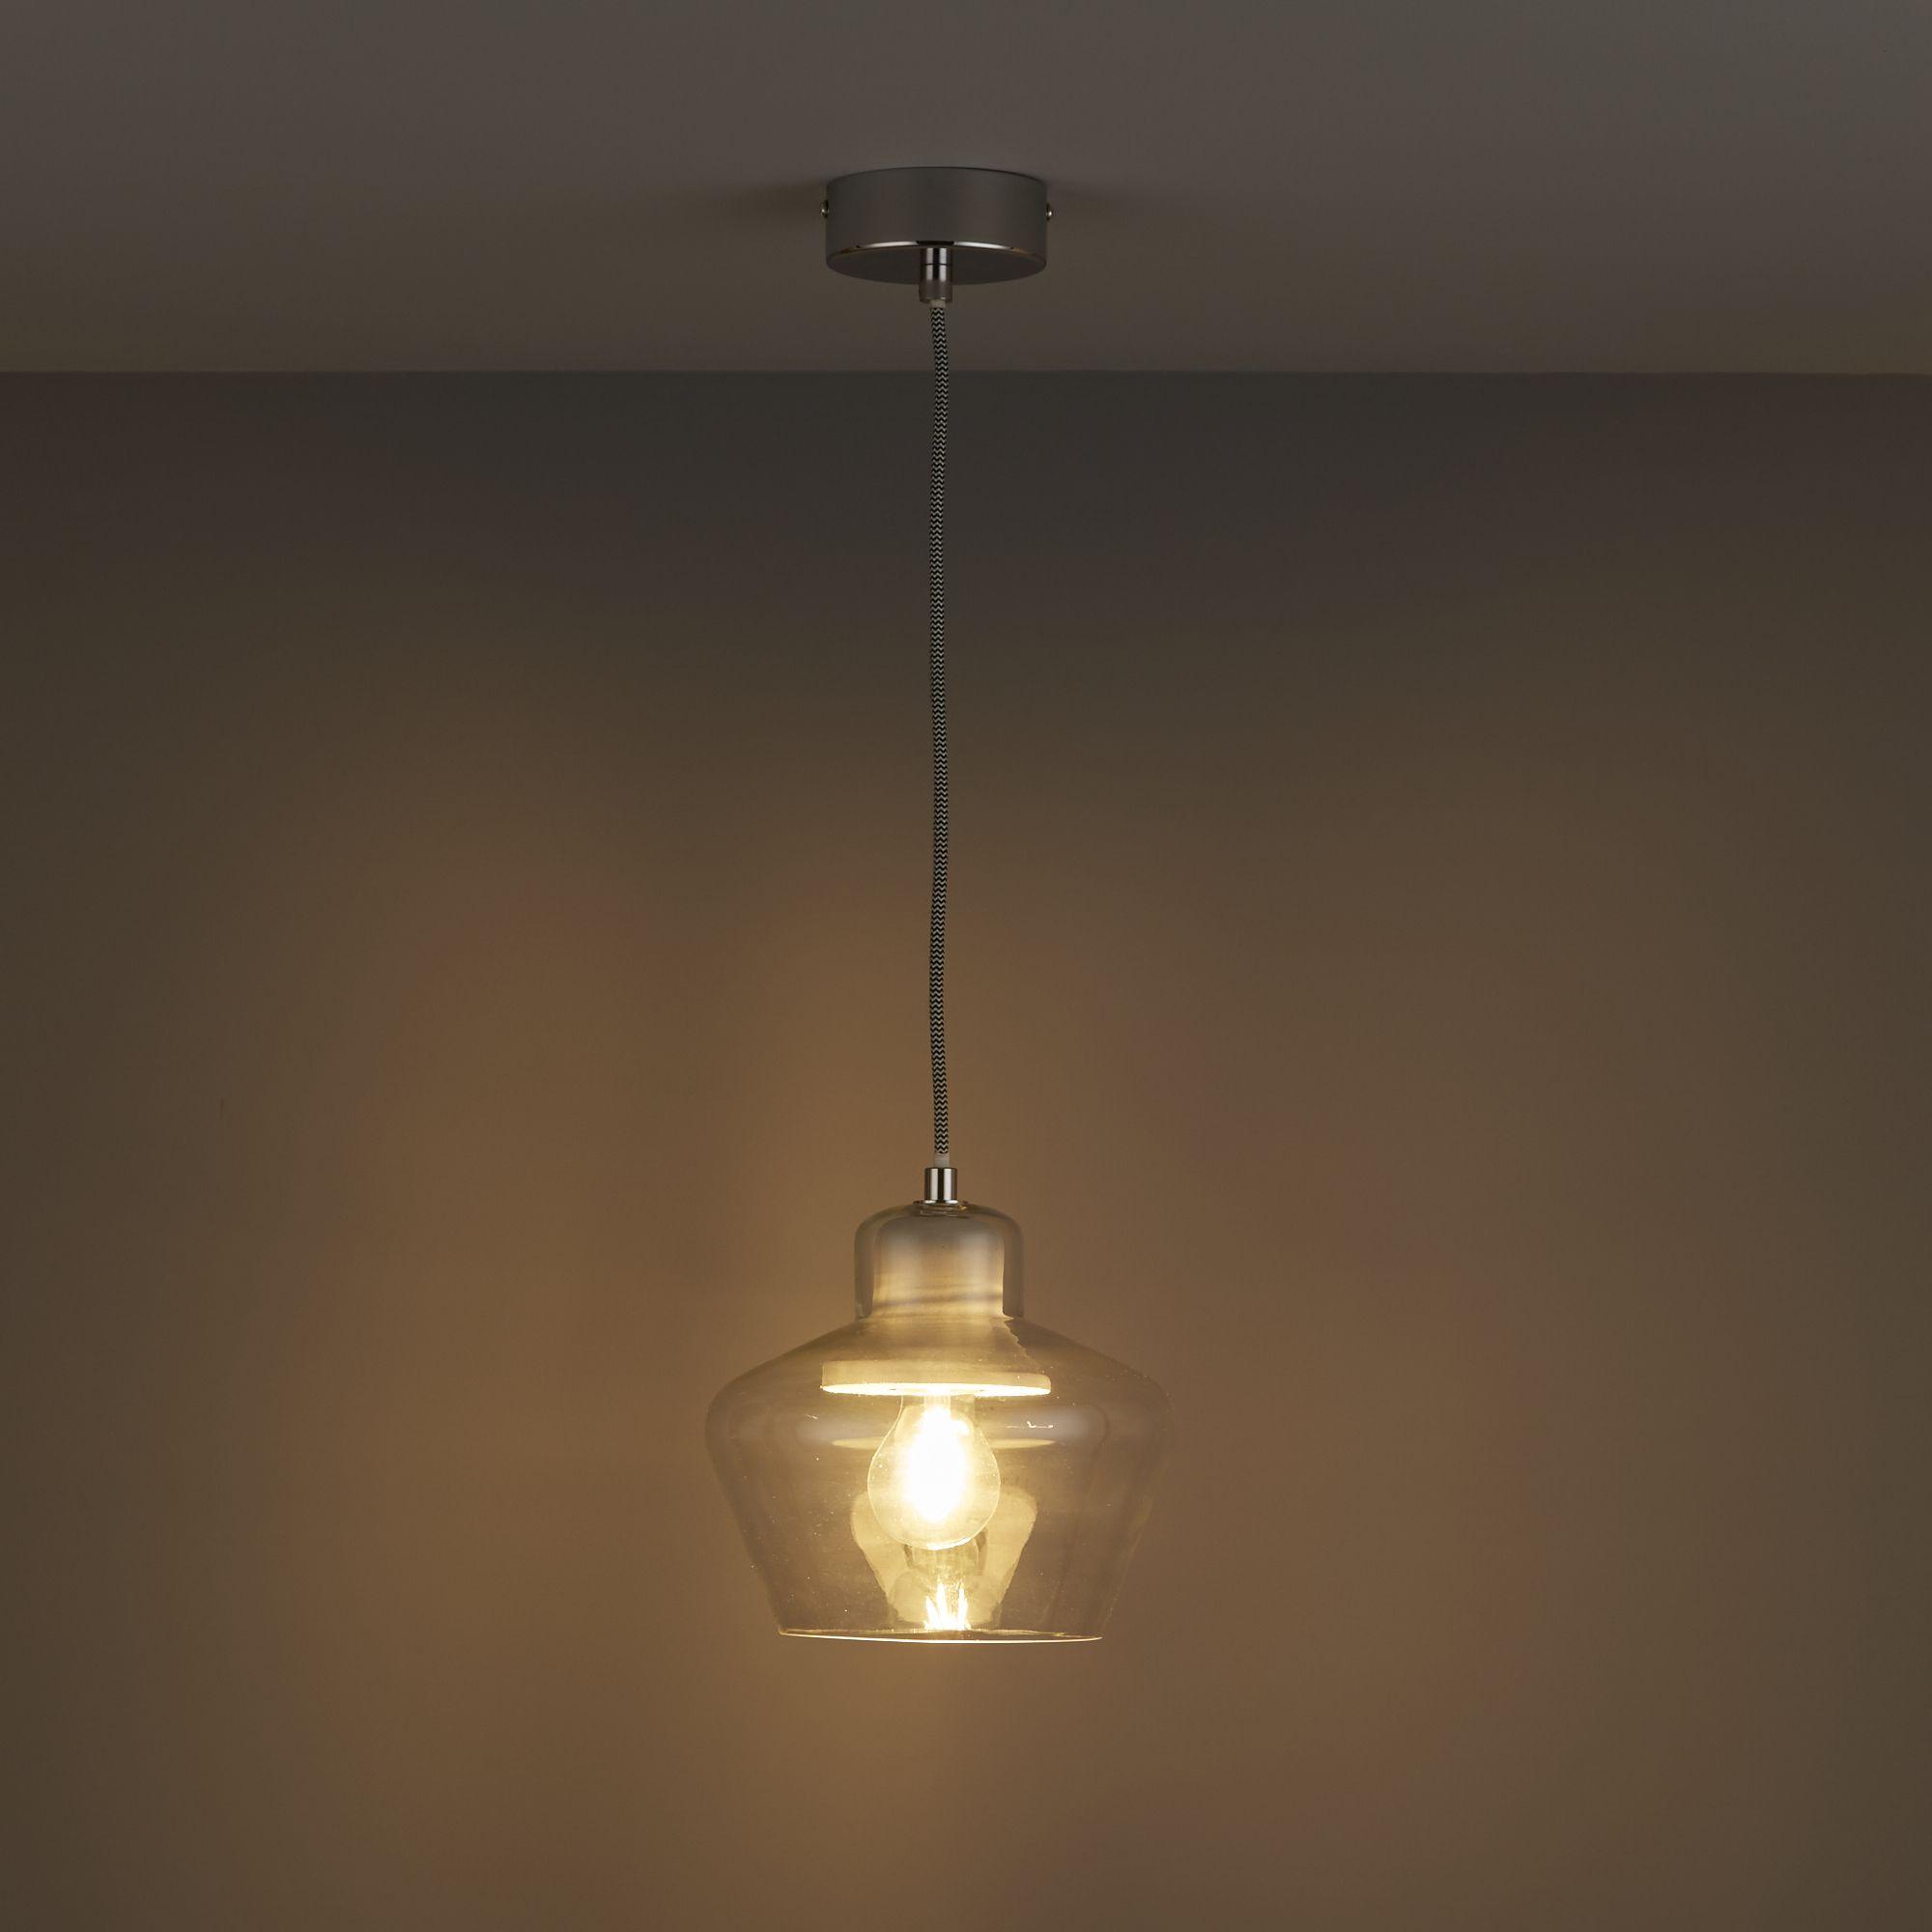 Jidda Clear Pendant Ceiling Light - Small